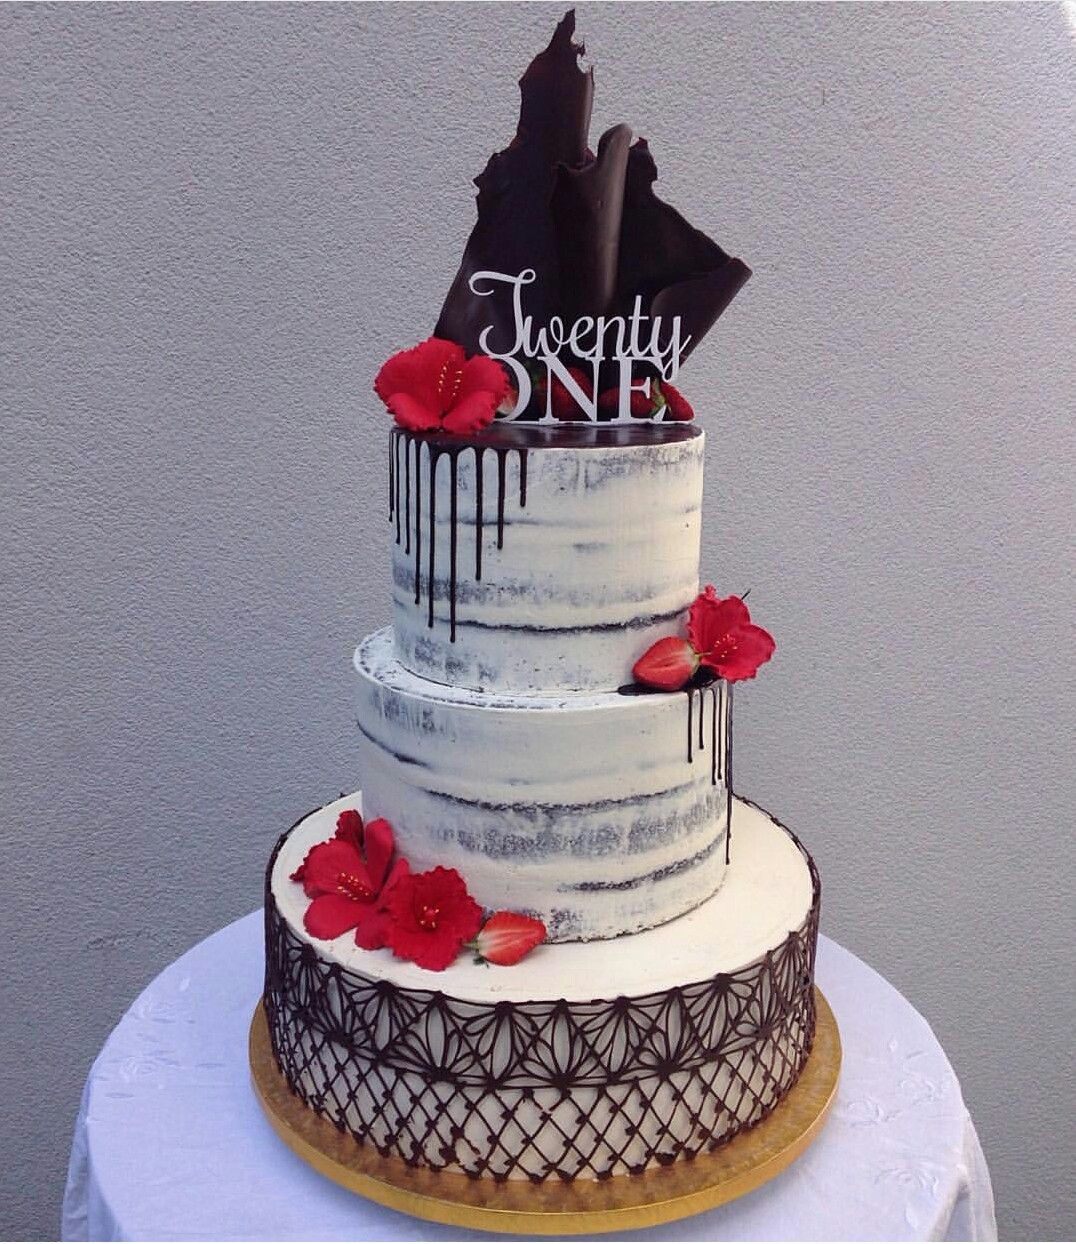 Épinglé par Leticia Martinez sur POLYNESIAN DESIGN CAKE